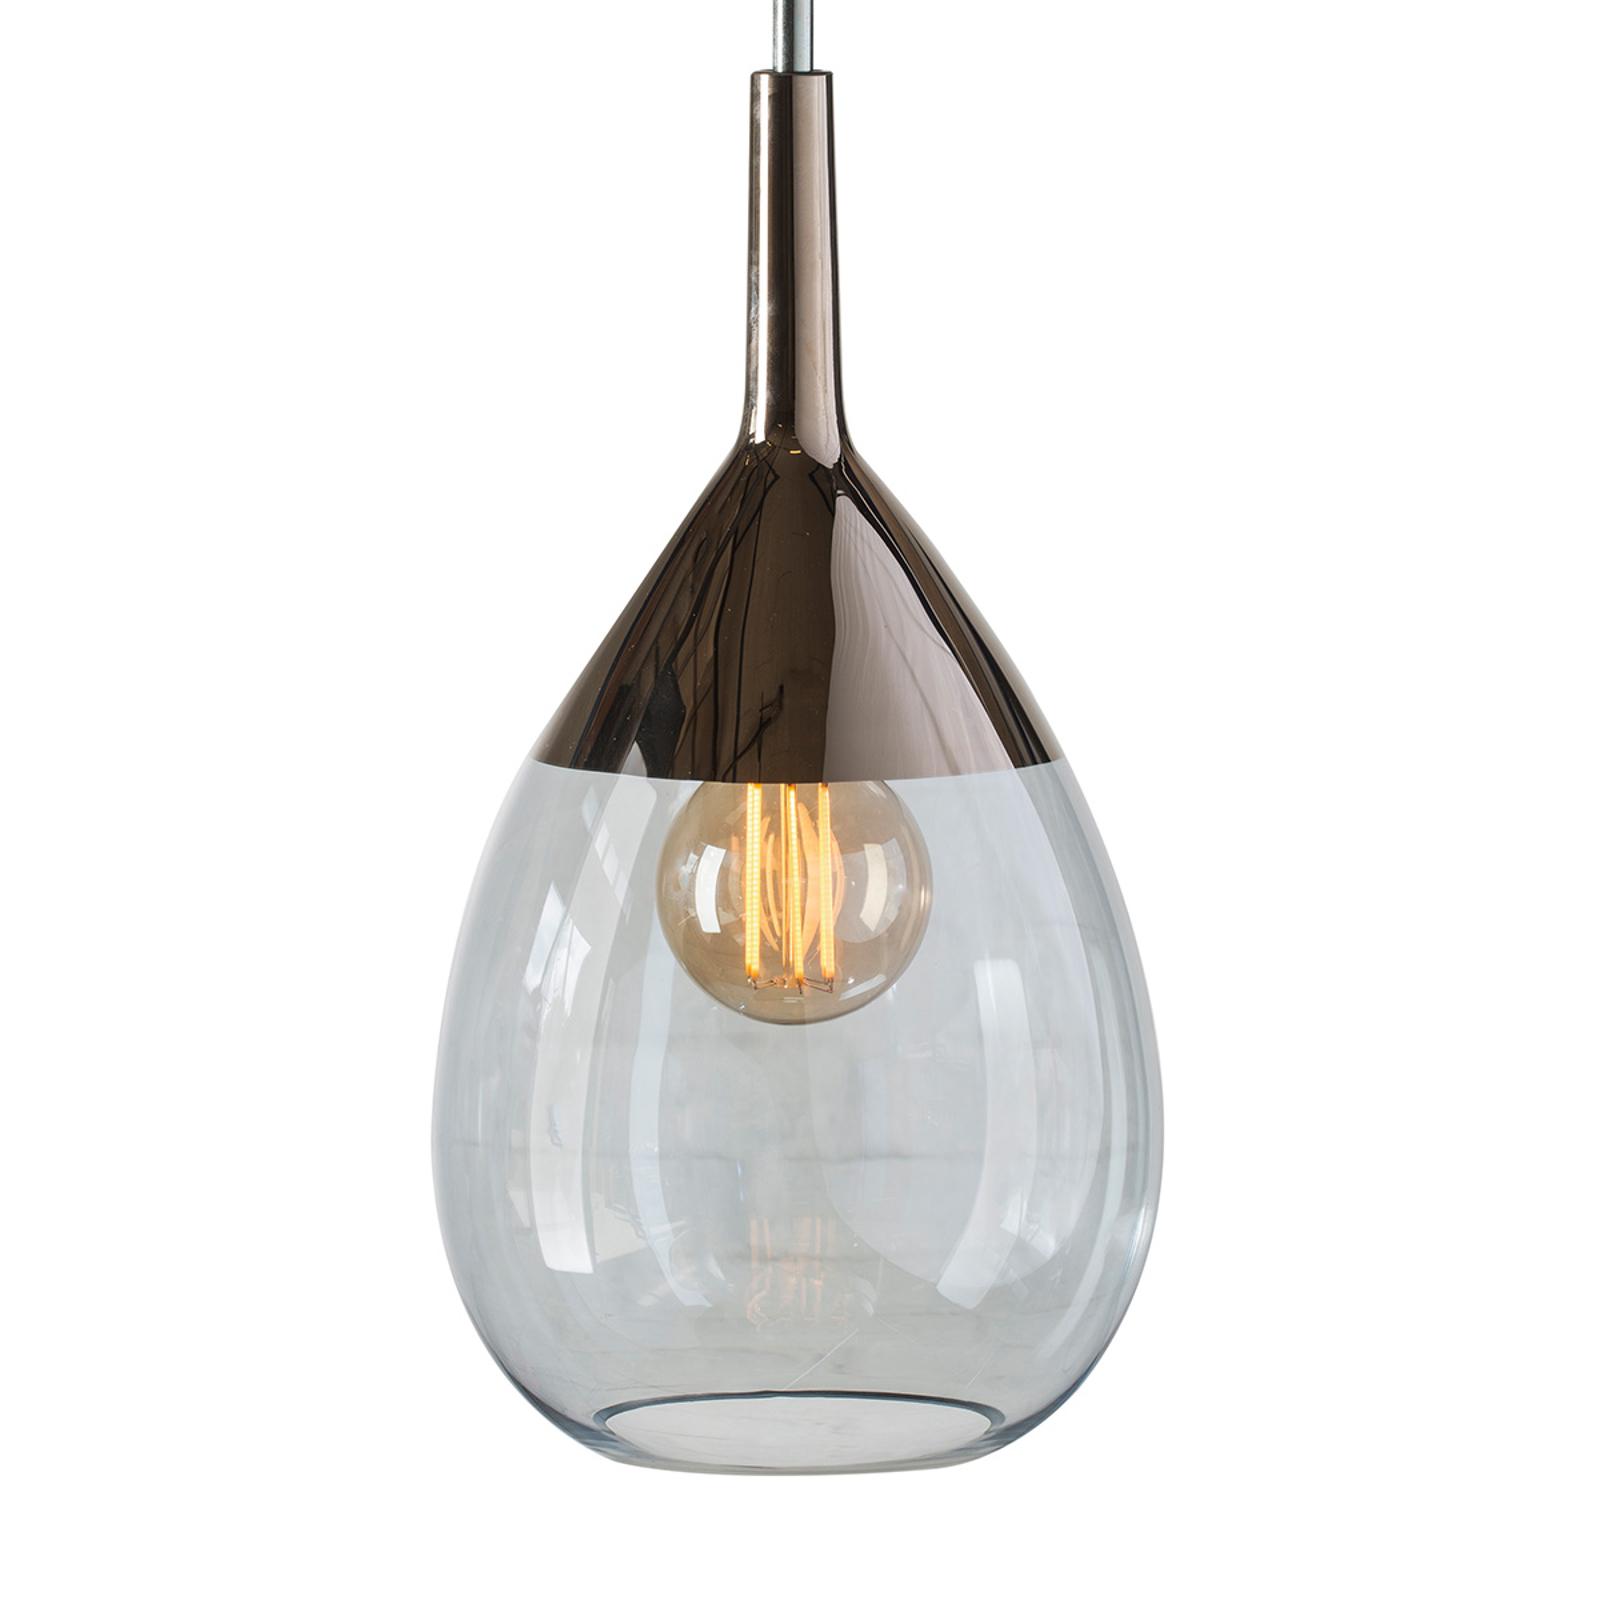 EBB & FLOW Lute hanglamp platina, glas blauw